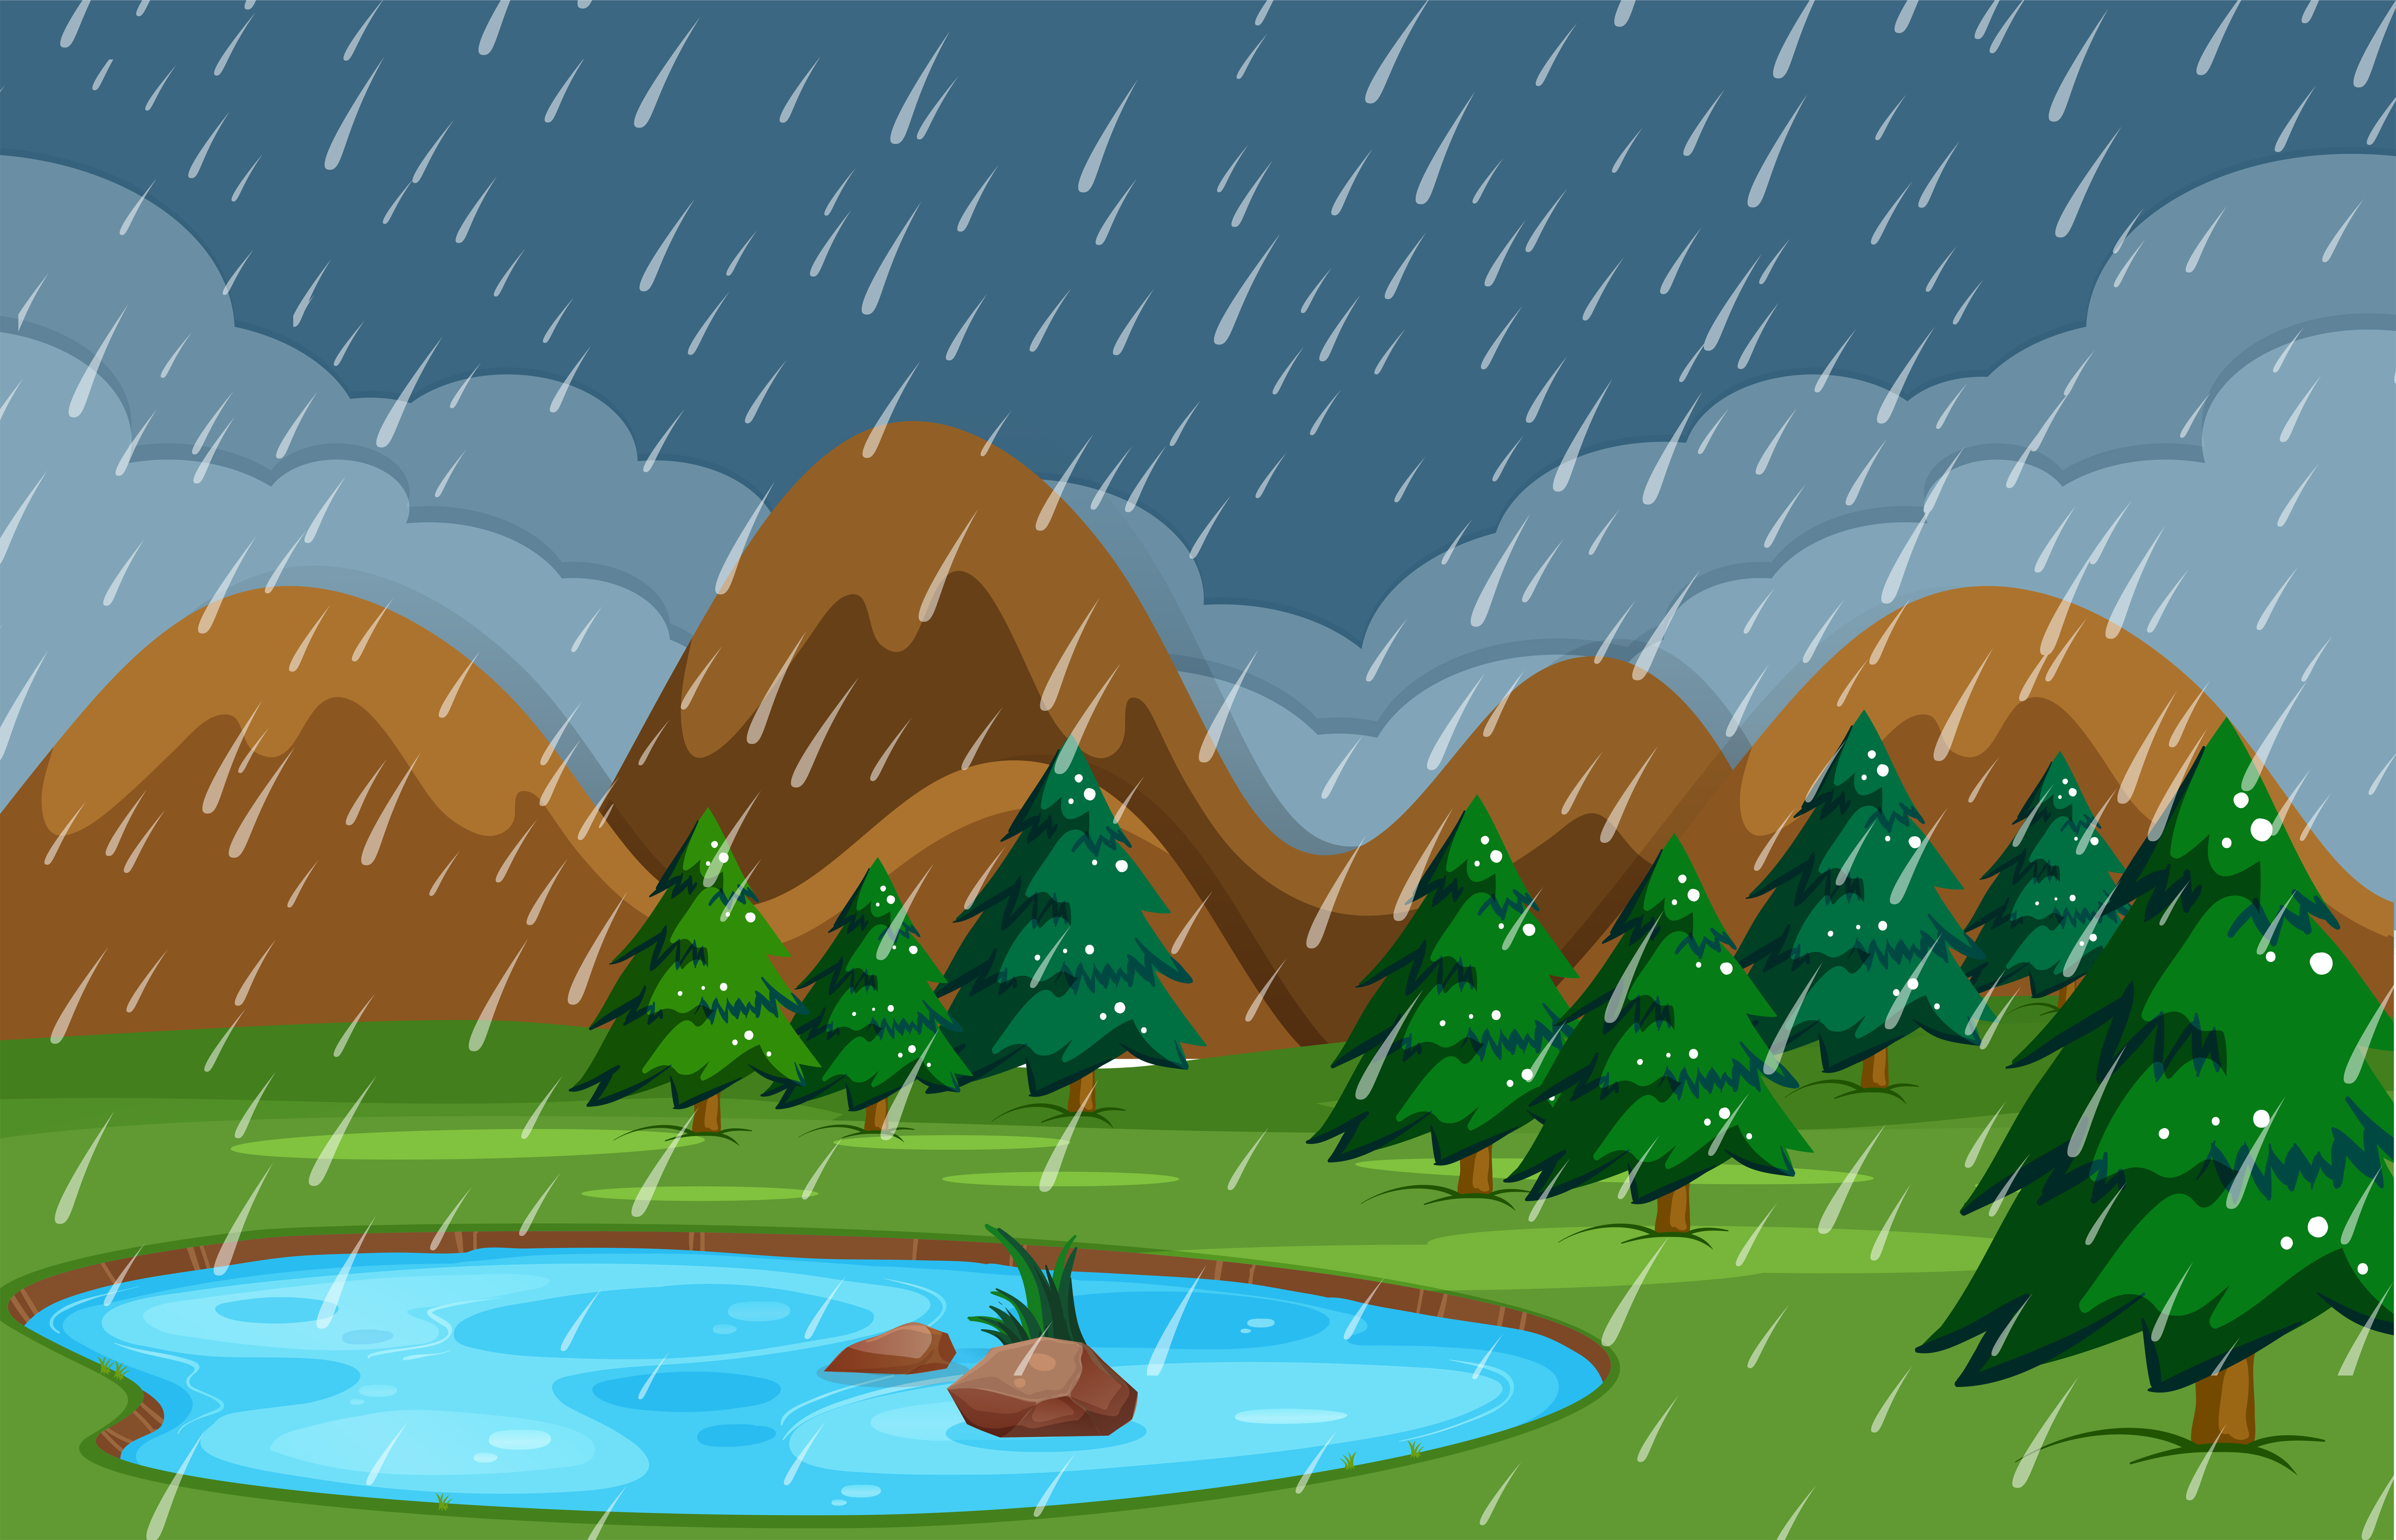 Rainy night at pond nature - Download Free Vectors ...